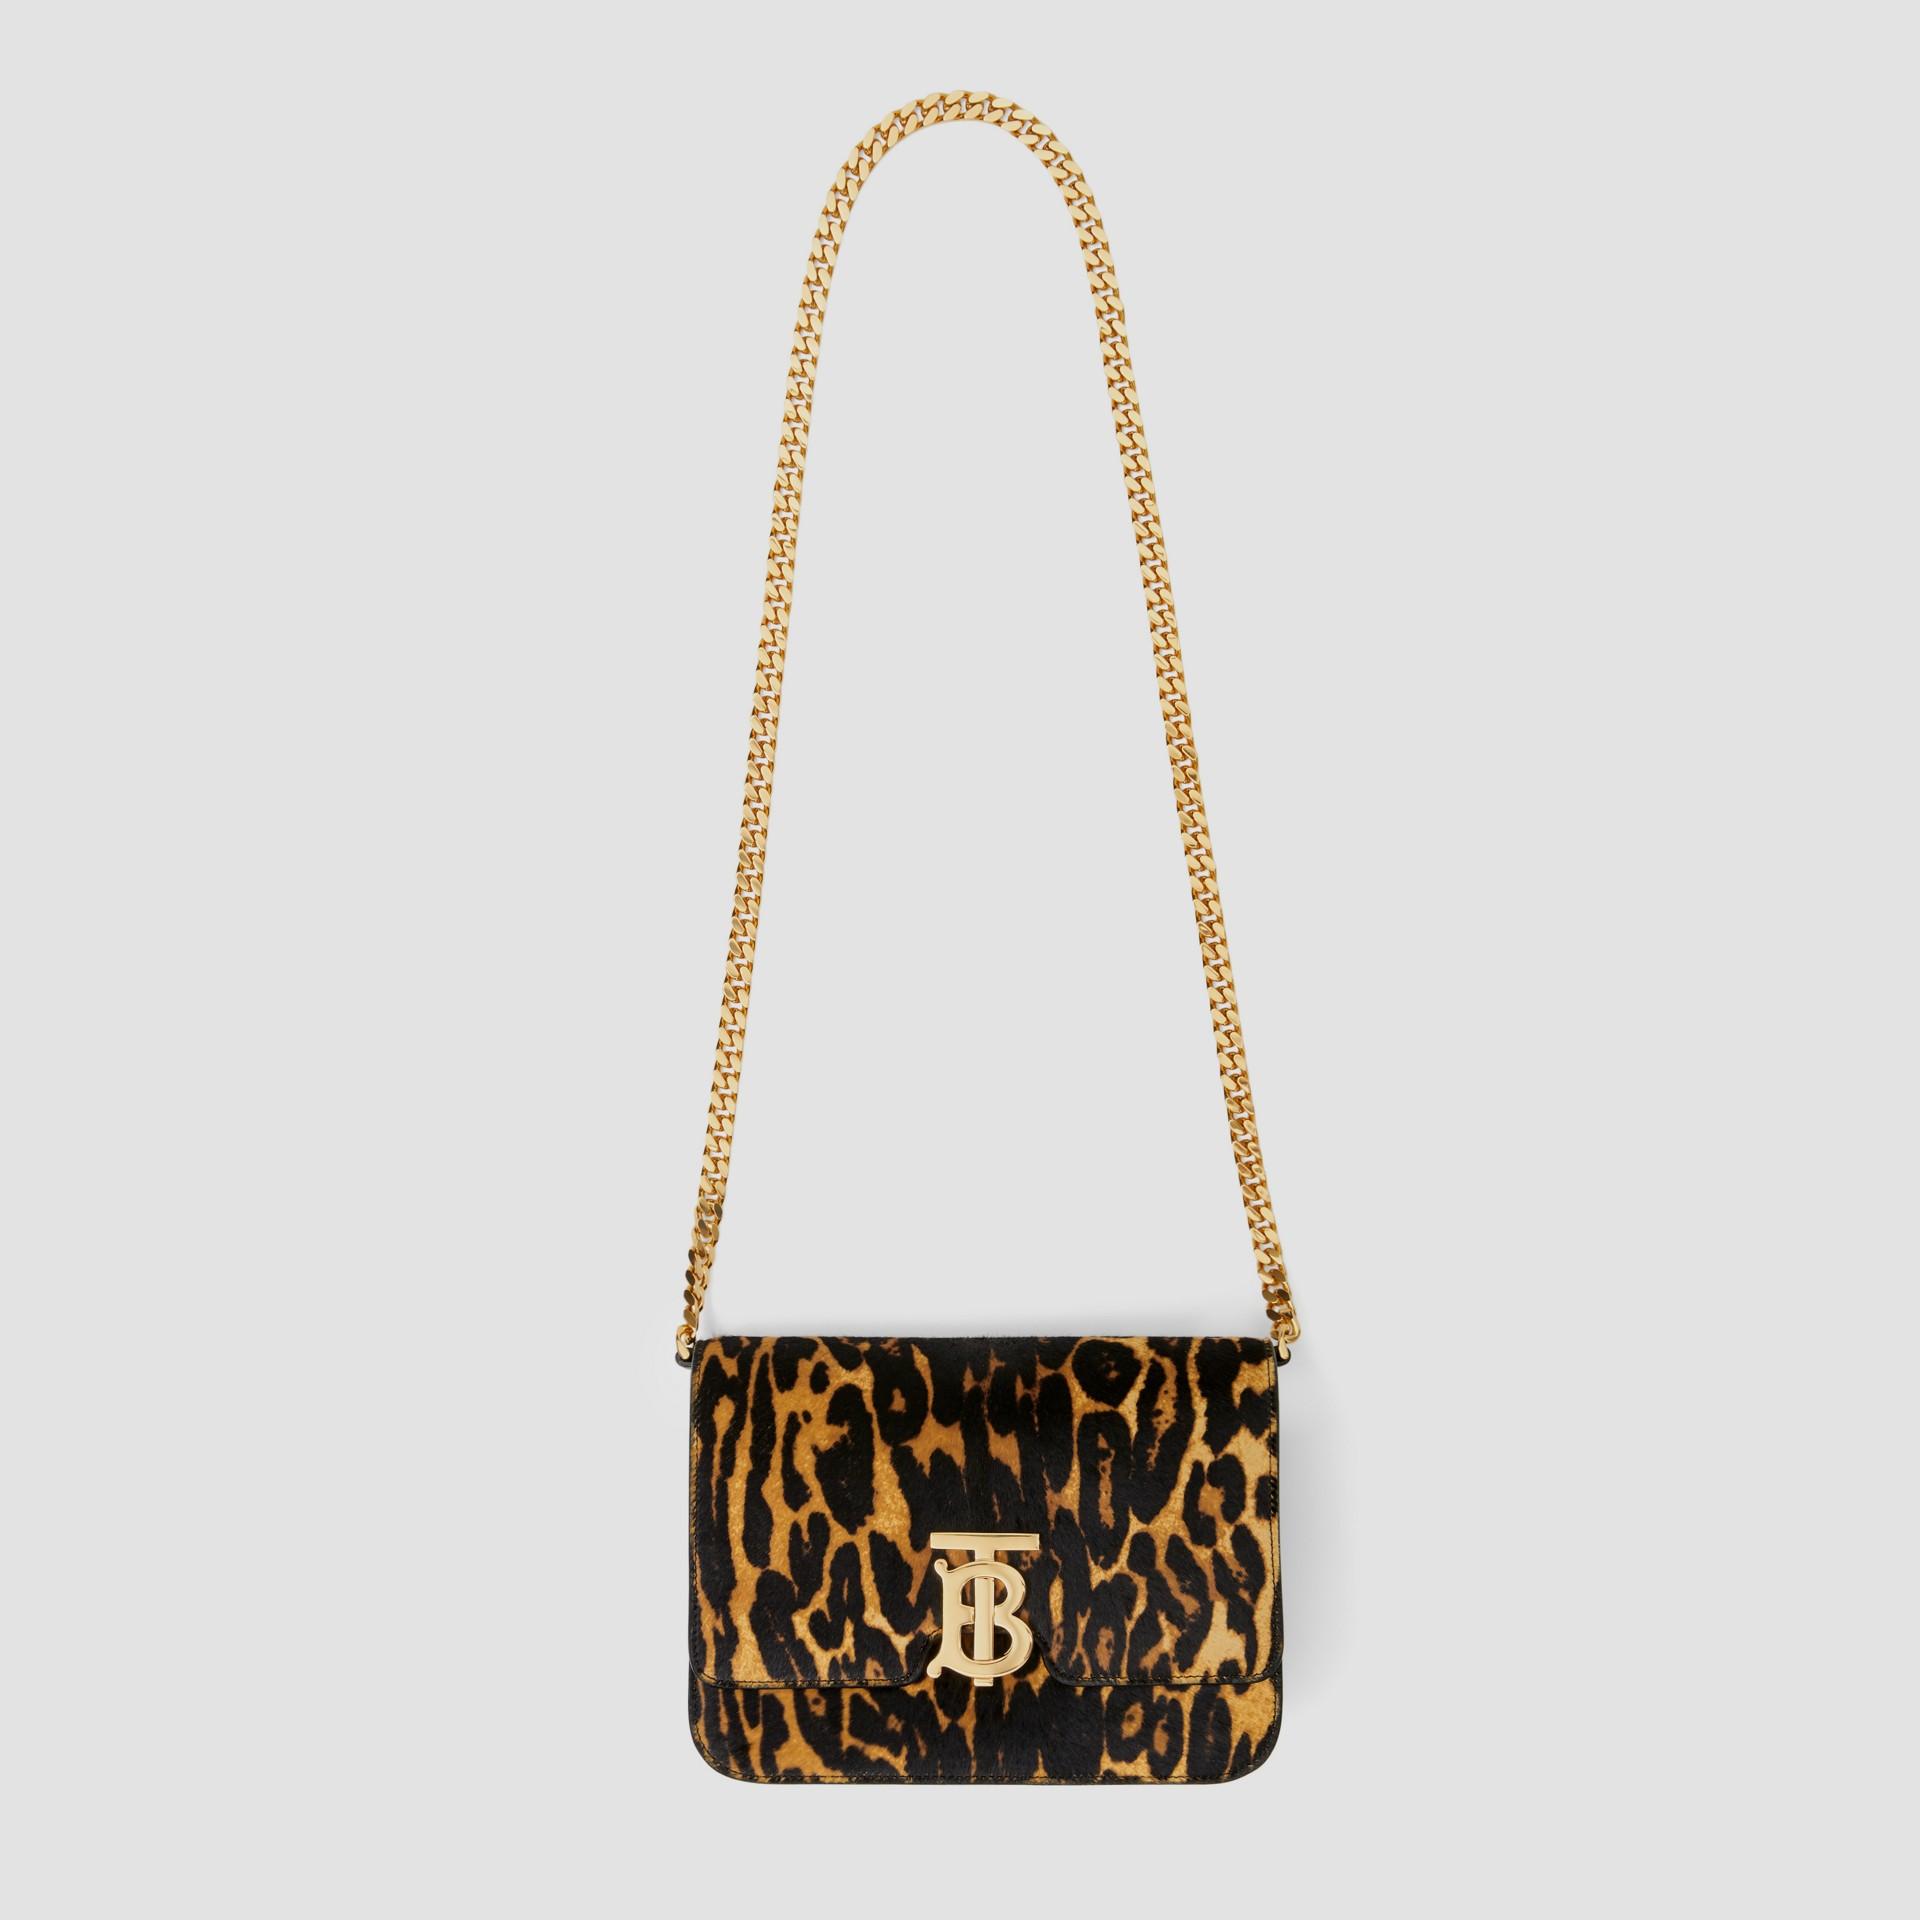 Small Leopard Print Calf Hair TB Bag in Dark Mustard - Women | Burberry Hong Kong S.A.R - gallery image 3